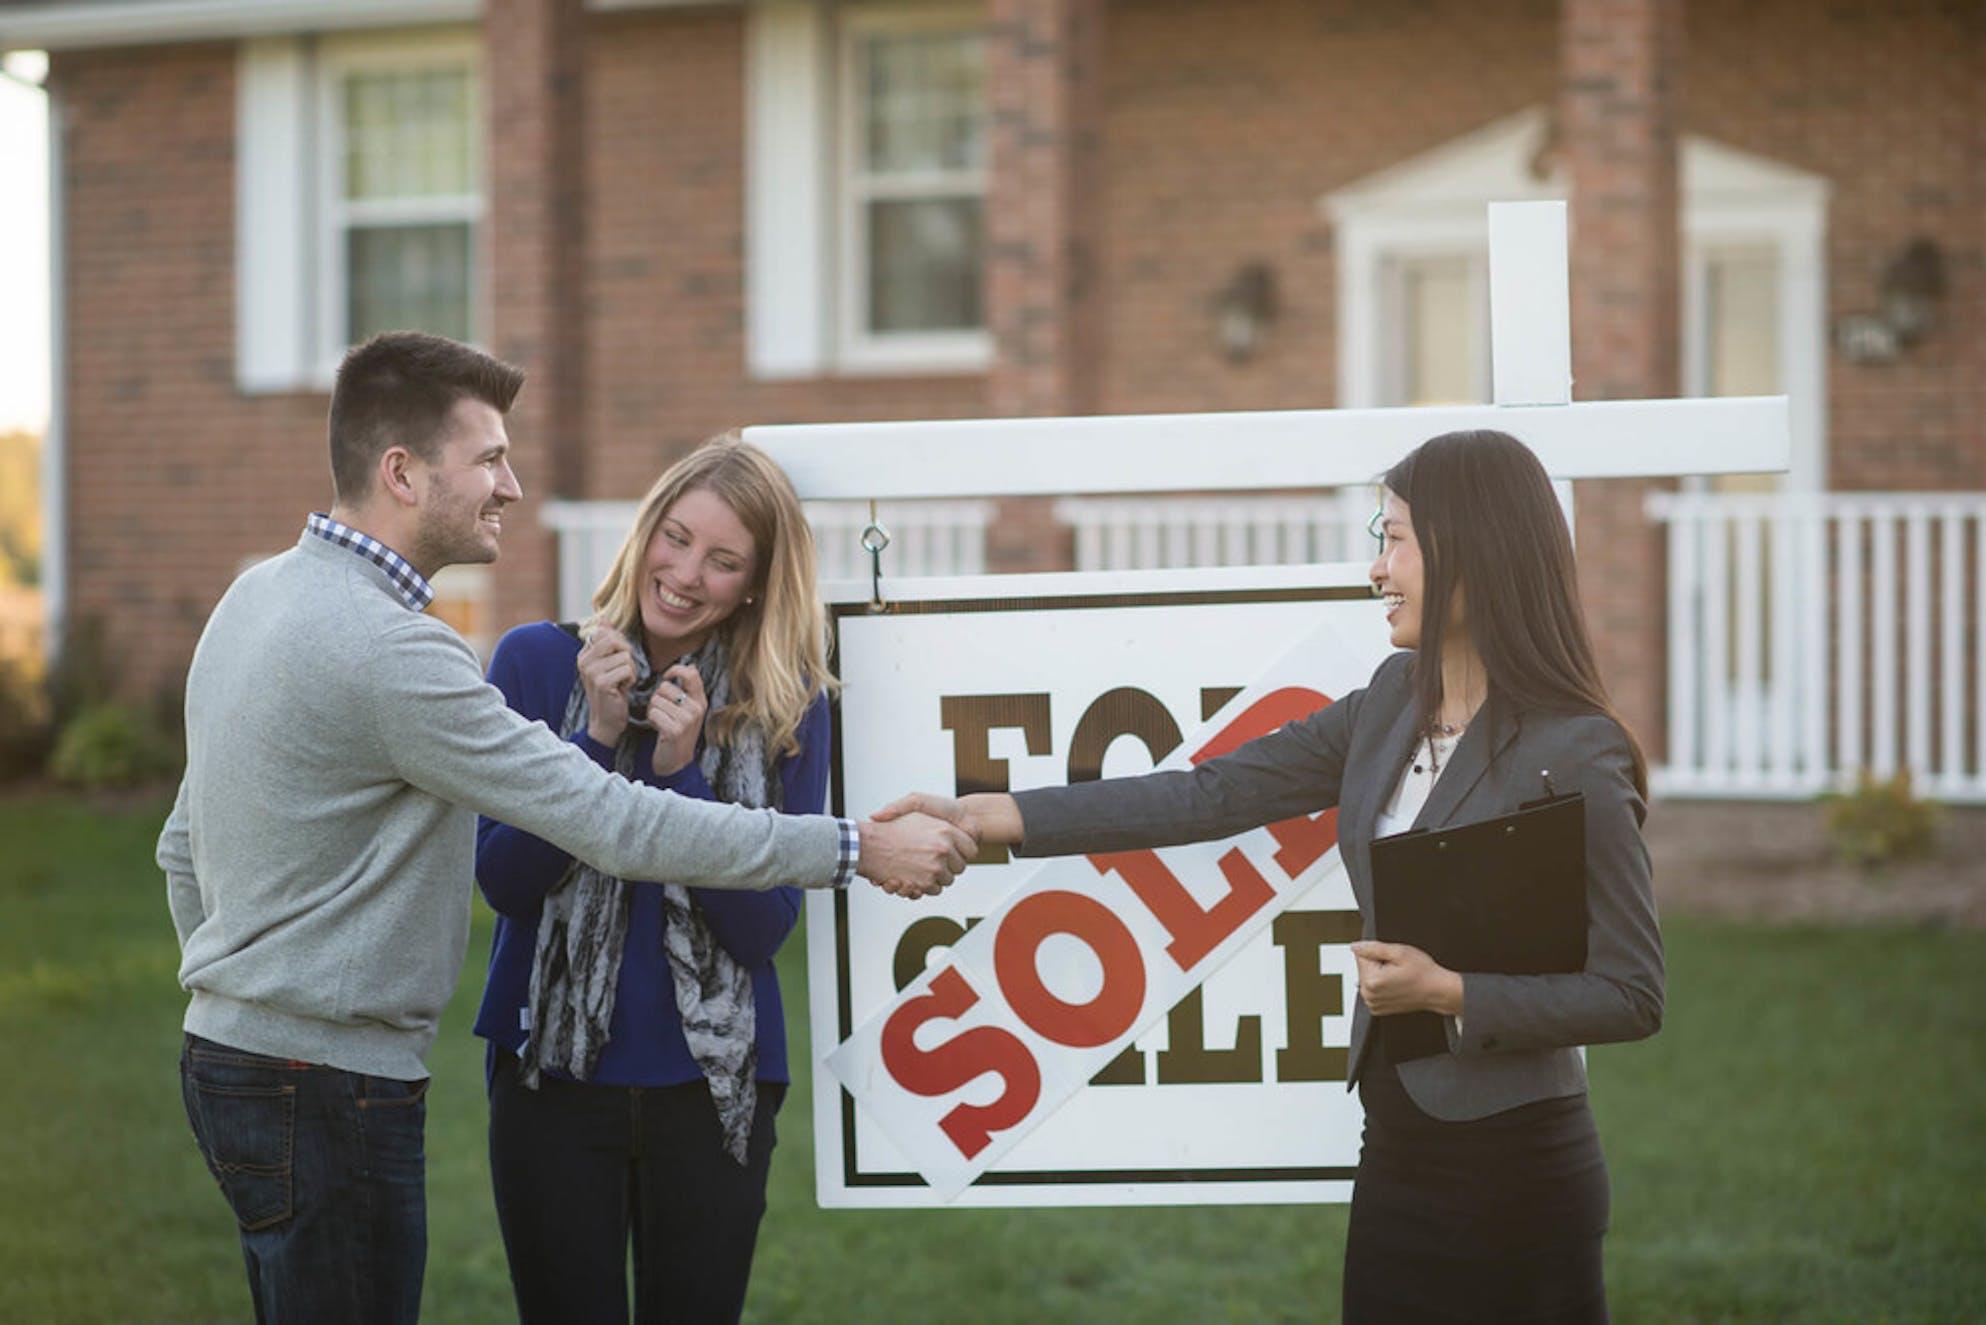 Couple bought a home via FHA loan